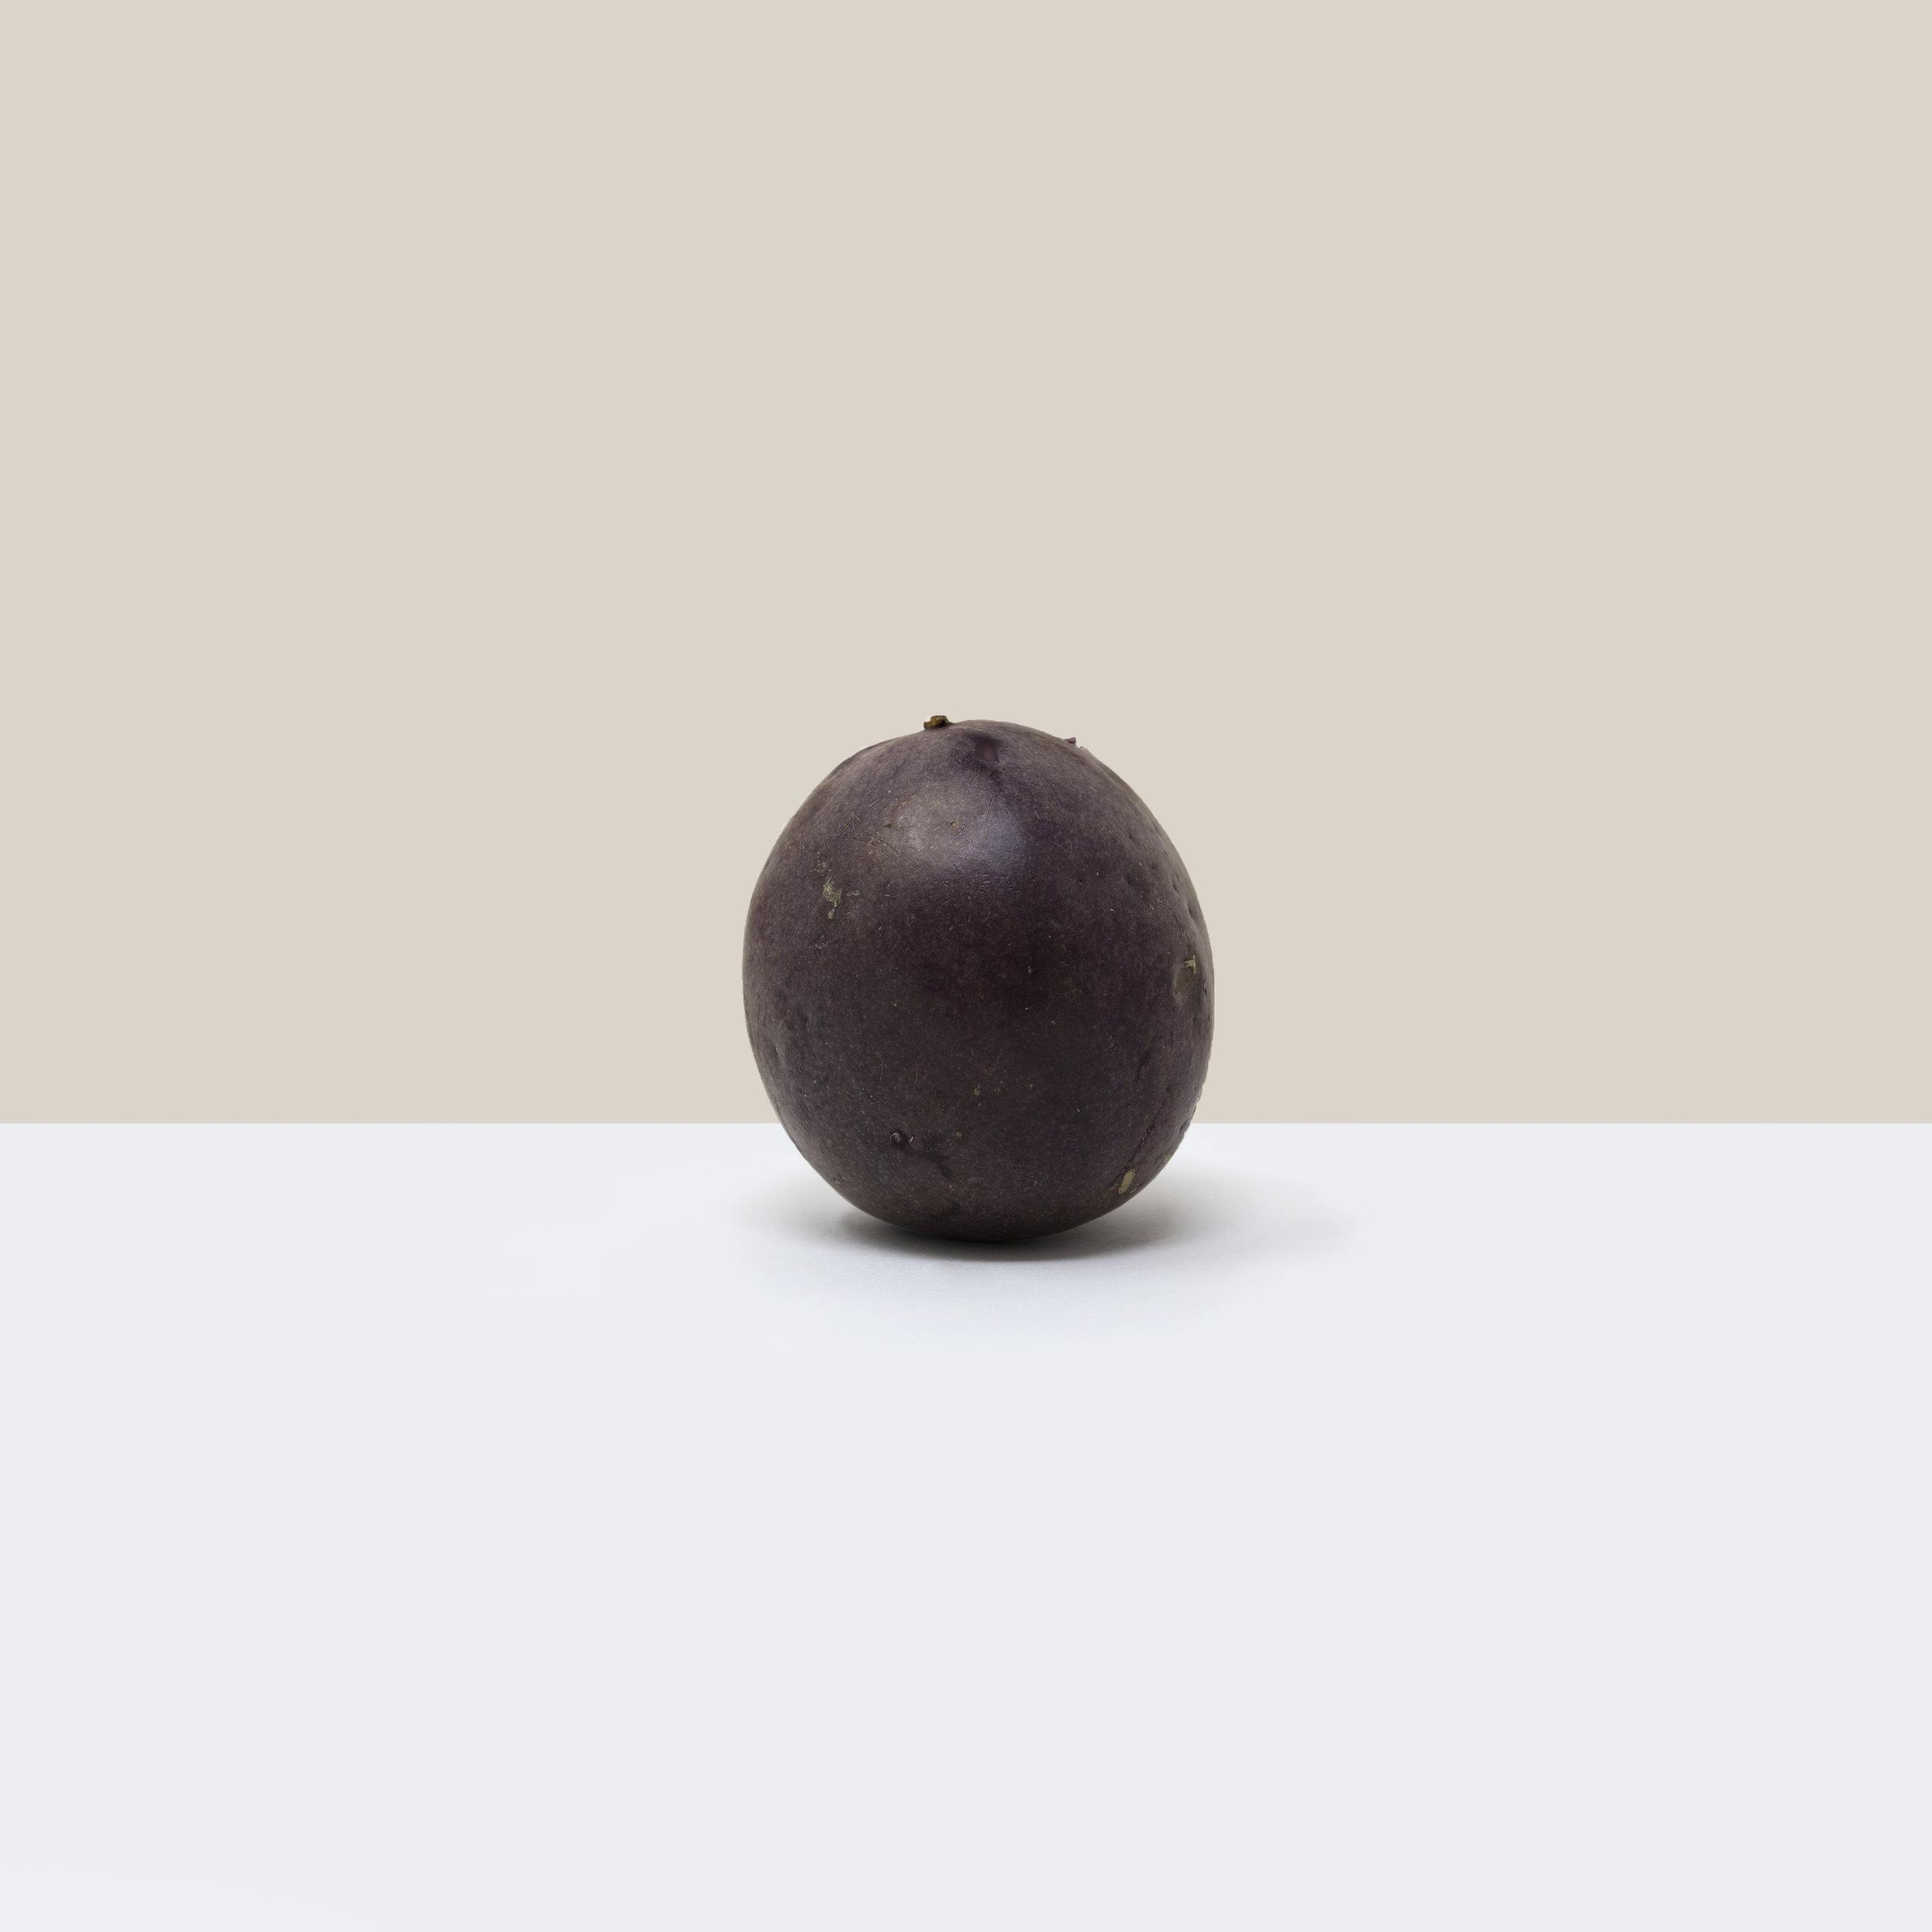 A simple, minimalist, contemporary, fine art photograph of a passionfruit